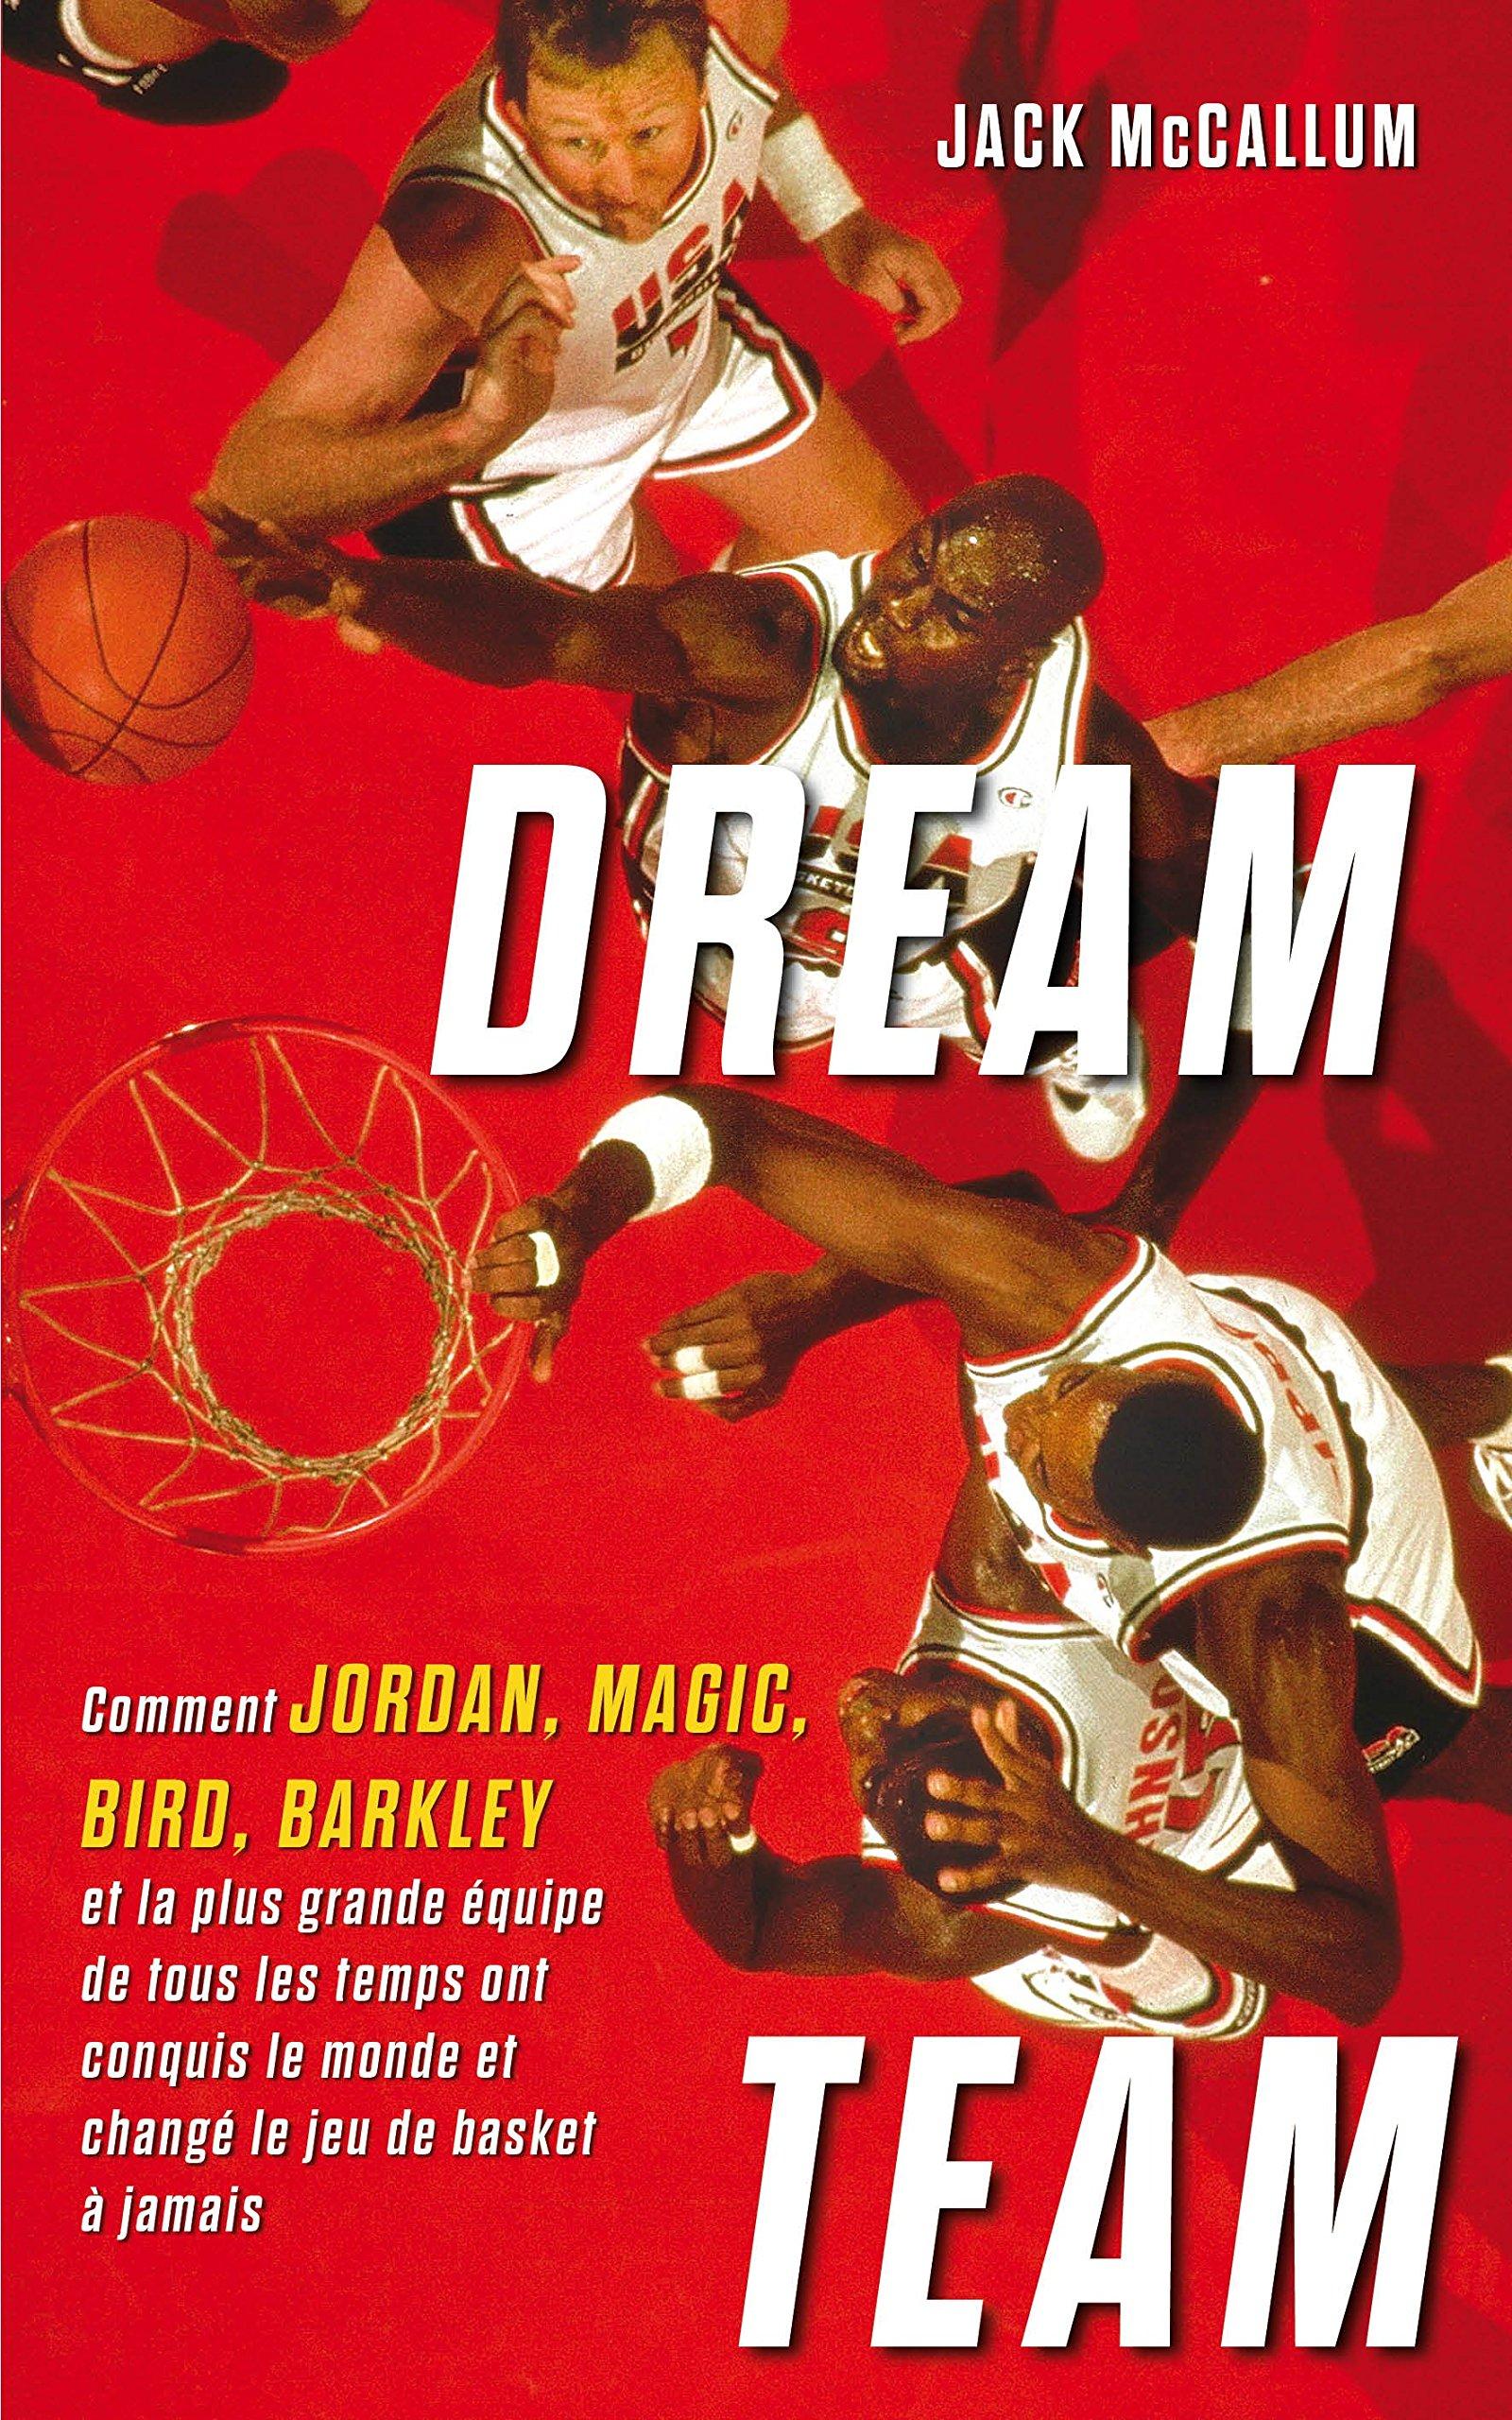 Grande Et Plus Dream TeamComment JordanMagicBirdBarkley La cTlFJK1